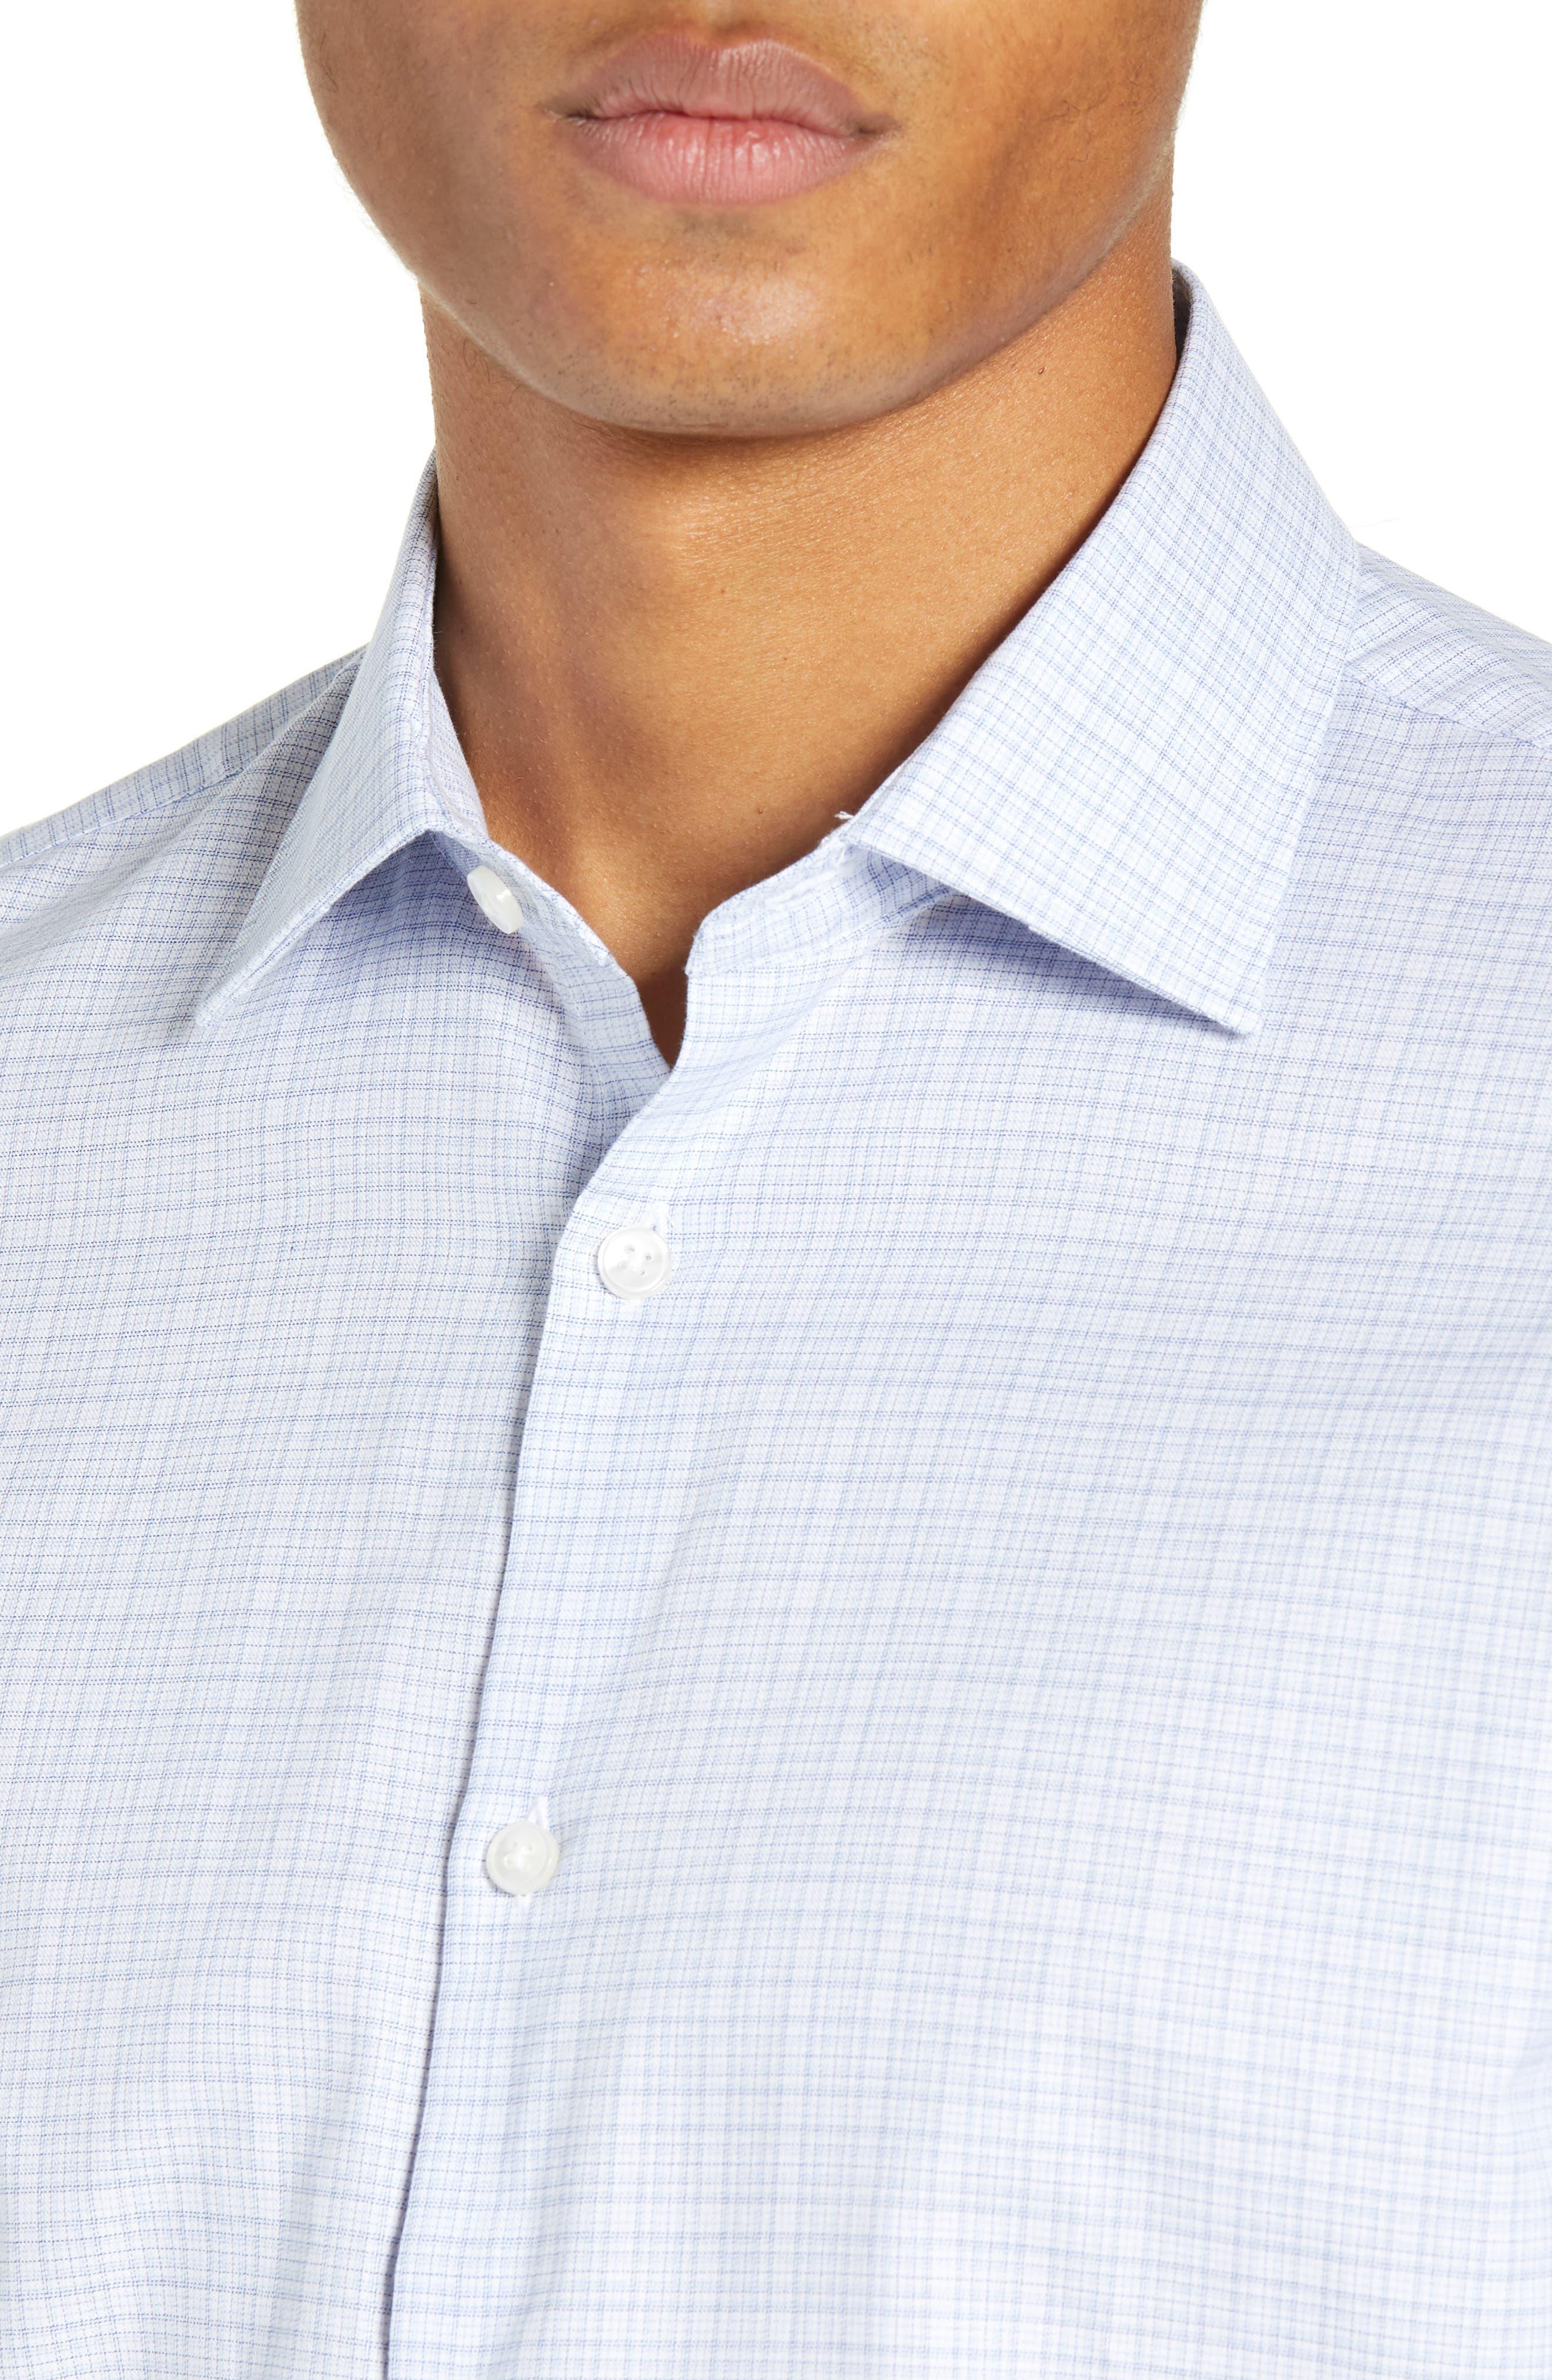 Regular Fit Plaid Dress Shirt,                             Alternate thumbnail 2, color,                             SKY BLUE